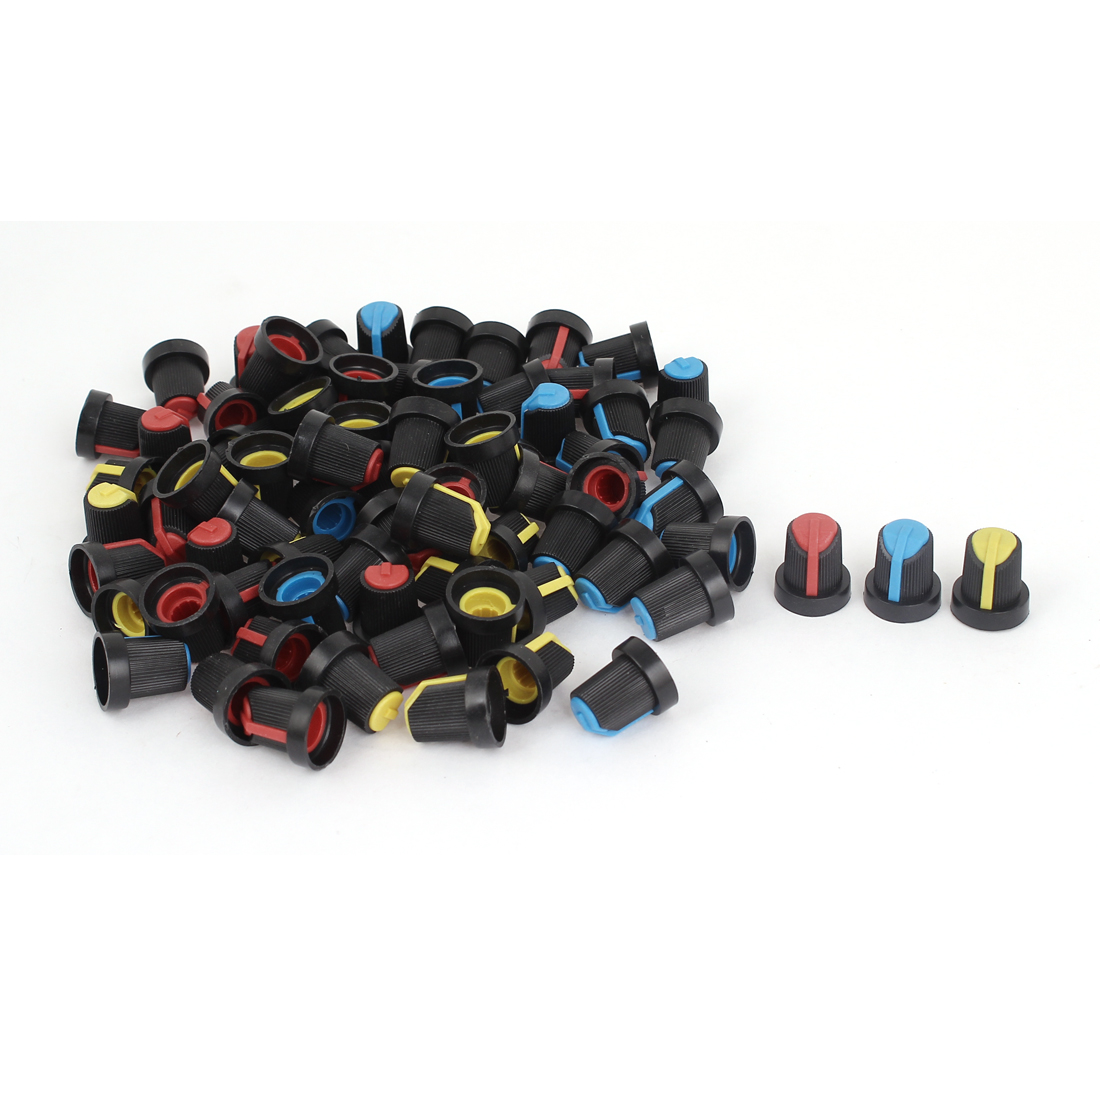 Knurled Shaft 6mm Hole Dia Potentiometer Volume Control Knob Cap 75 Pieces